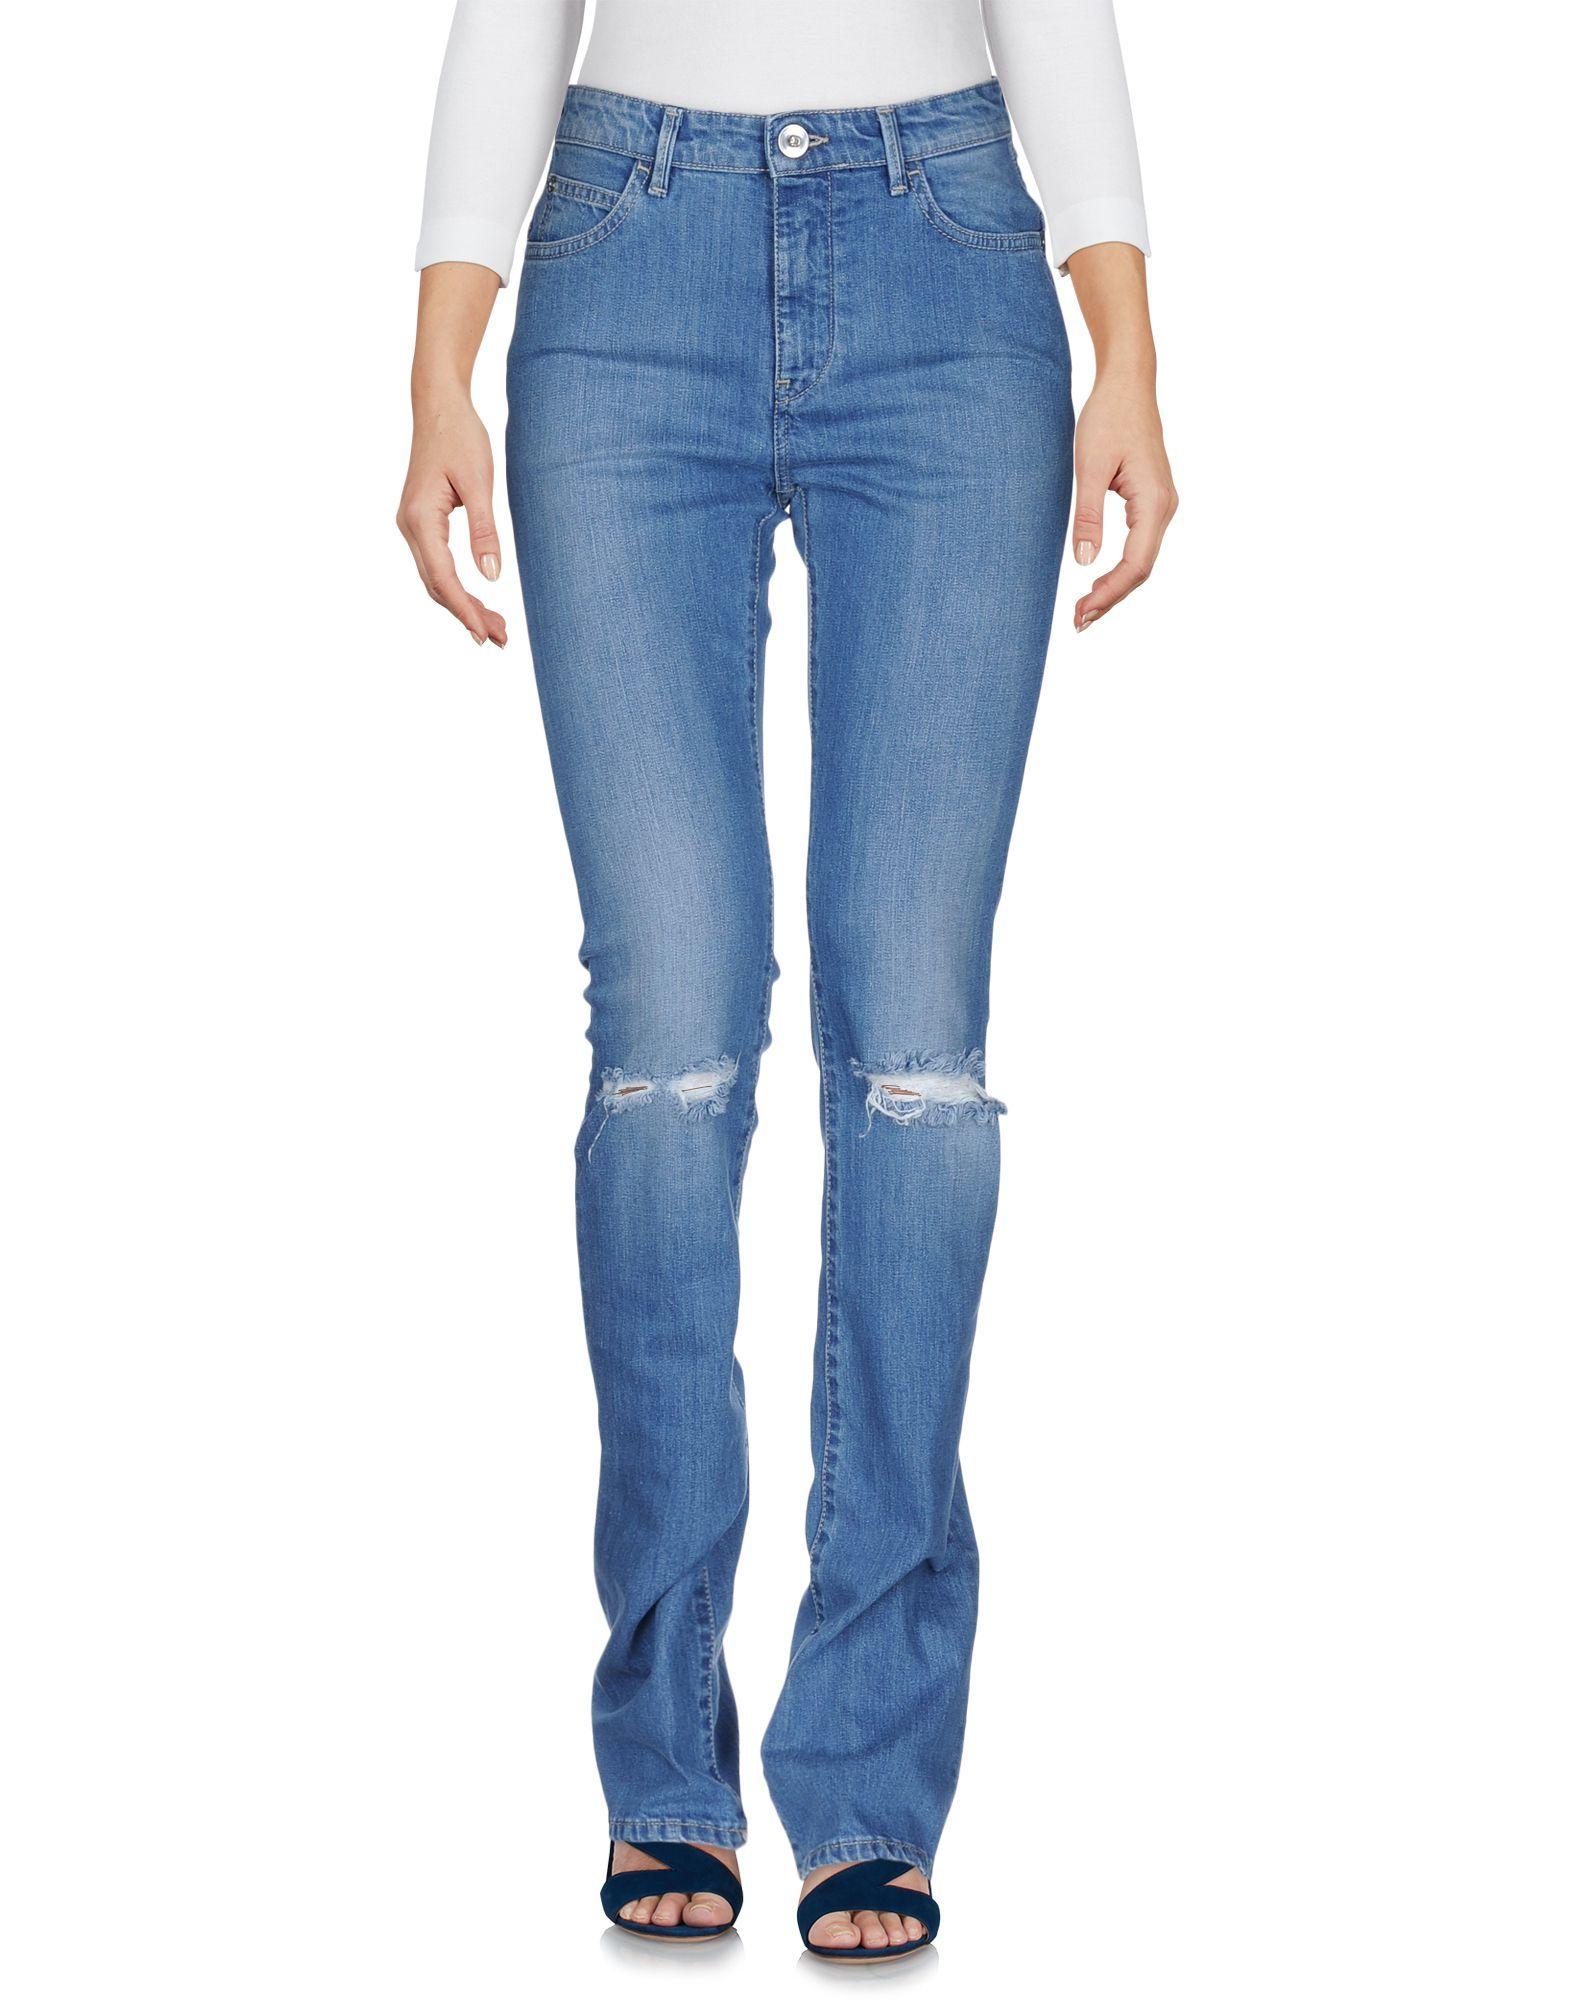 Haikure Blue Organic Cotton Bootcut Jeans